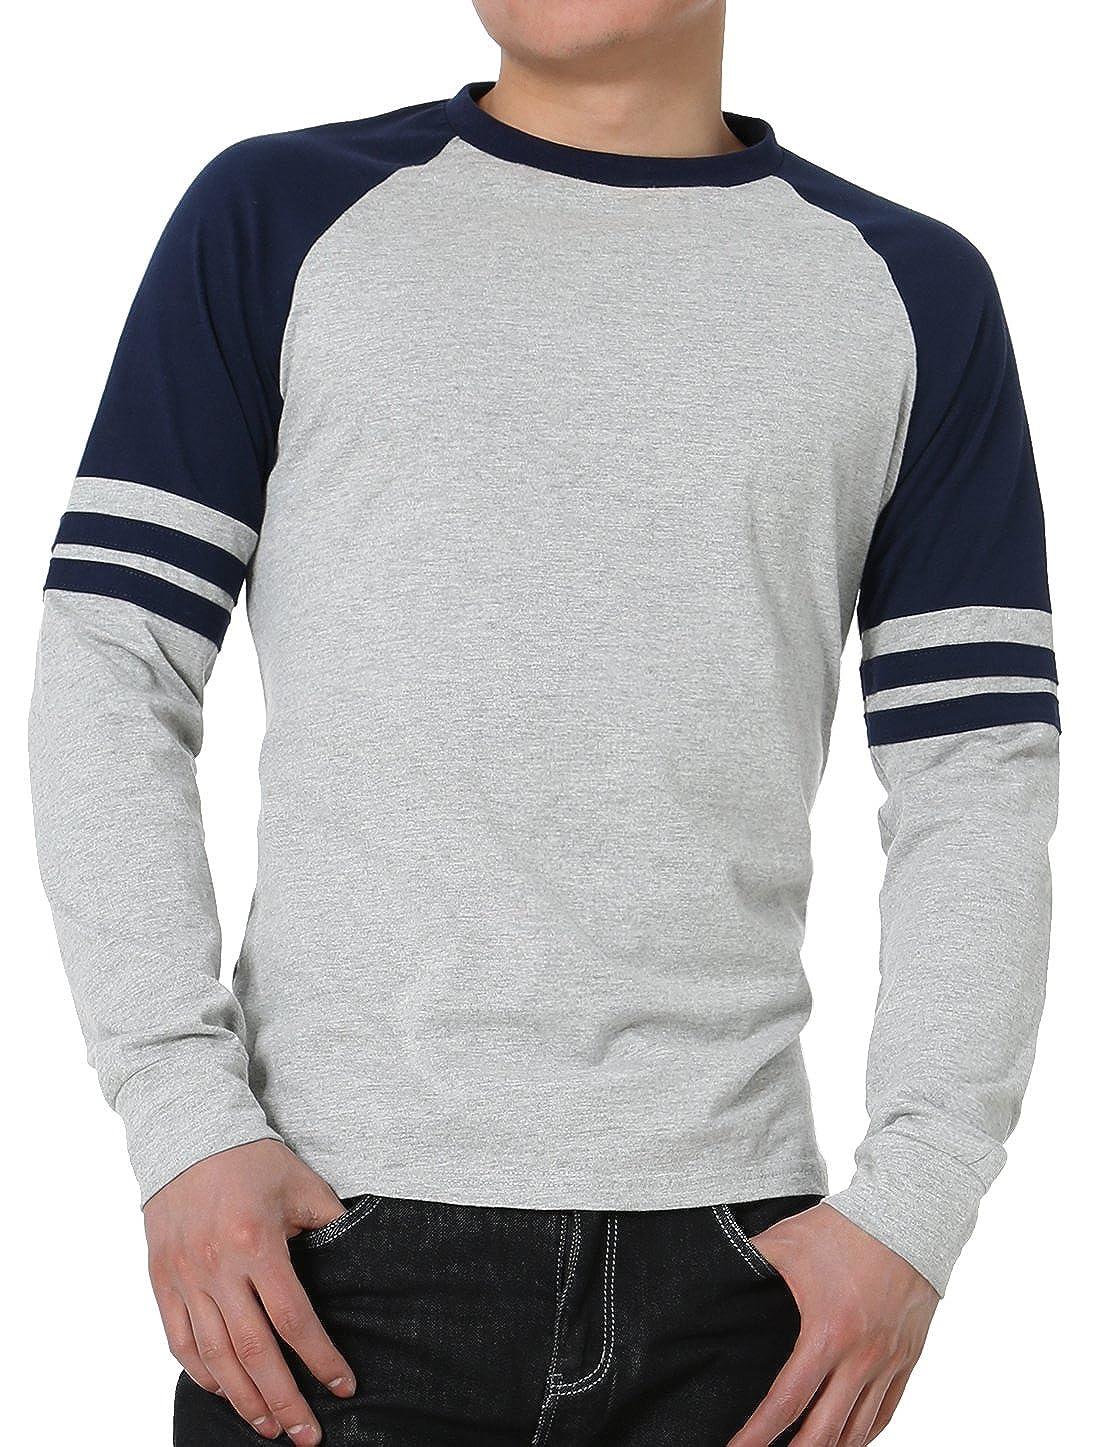 5dad8661c32 uxcell Men Causal Long Sleeves Crew Neck Contrast Colorblock Design Stripes  Baseball Raglan T-Shirt